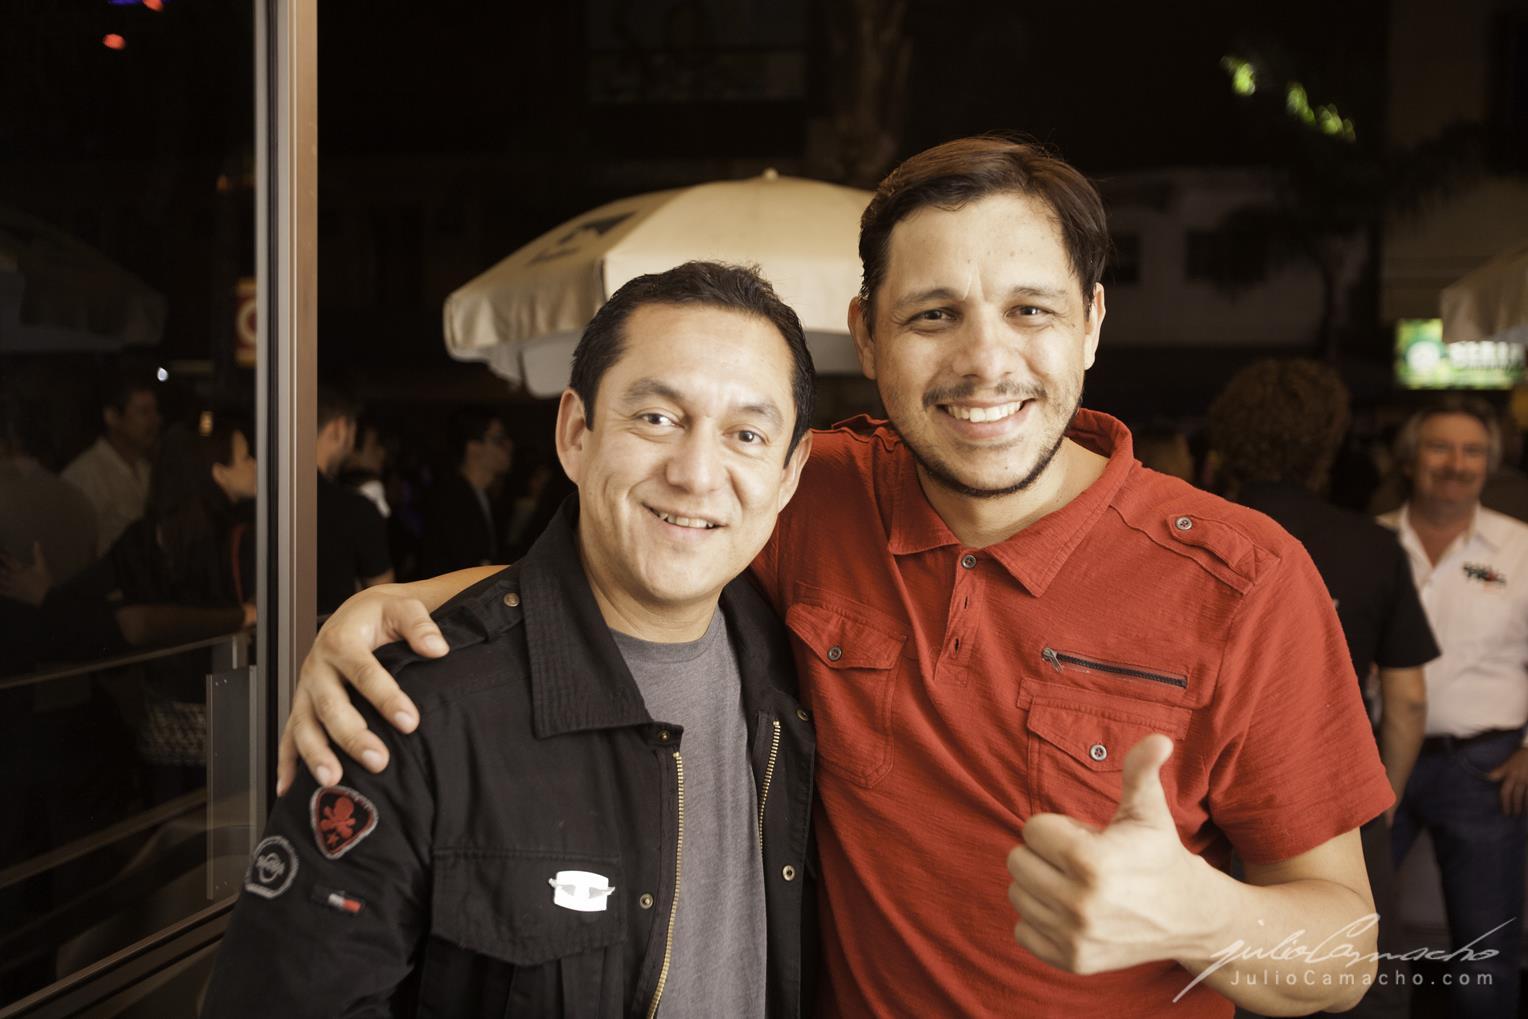 2014-10-30 31 CAST TOUR Ensenada y Tijuana - 1902 - www.Juli (Copy).jpg